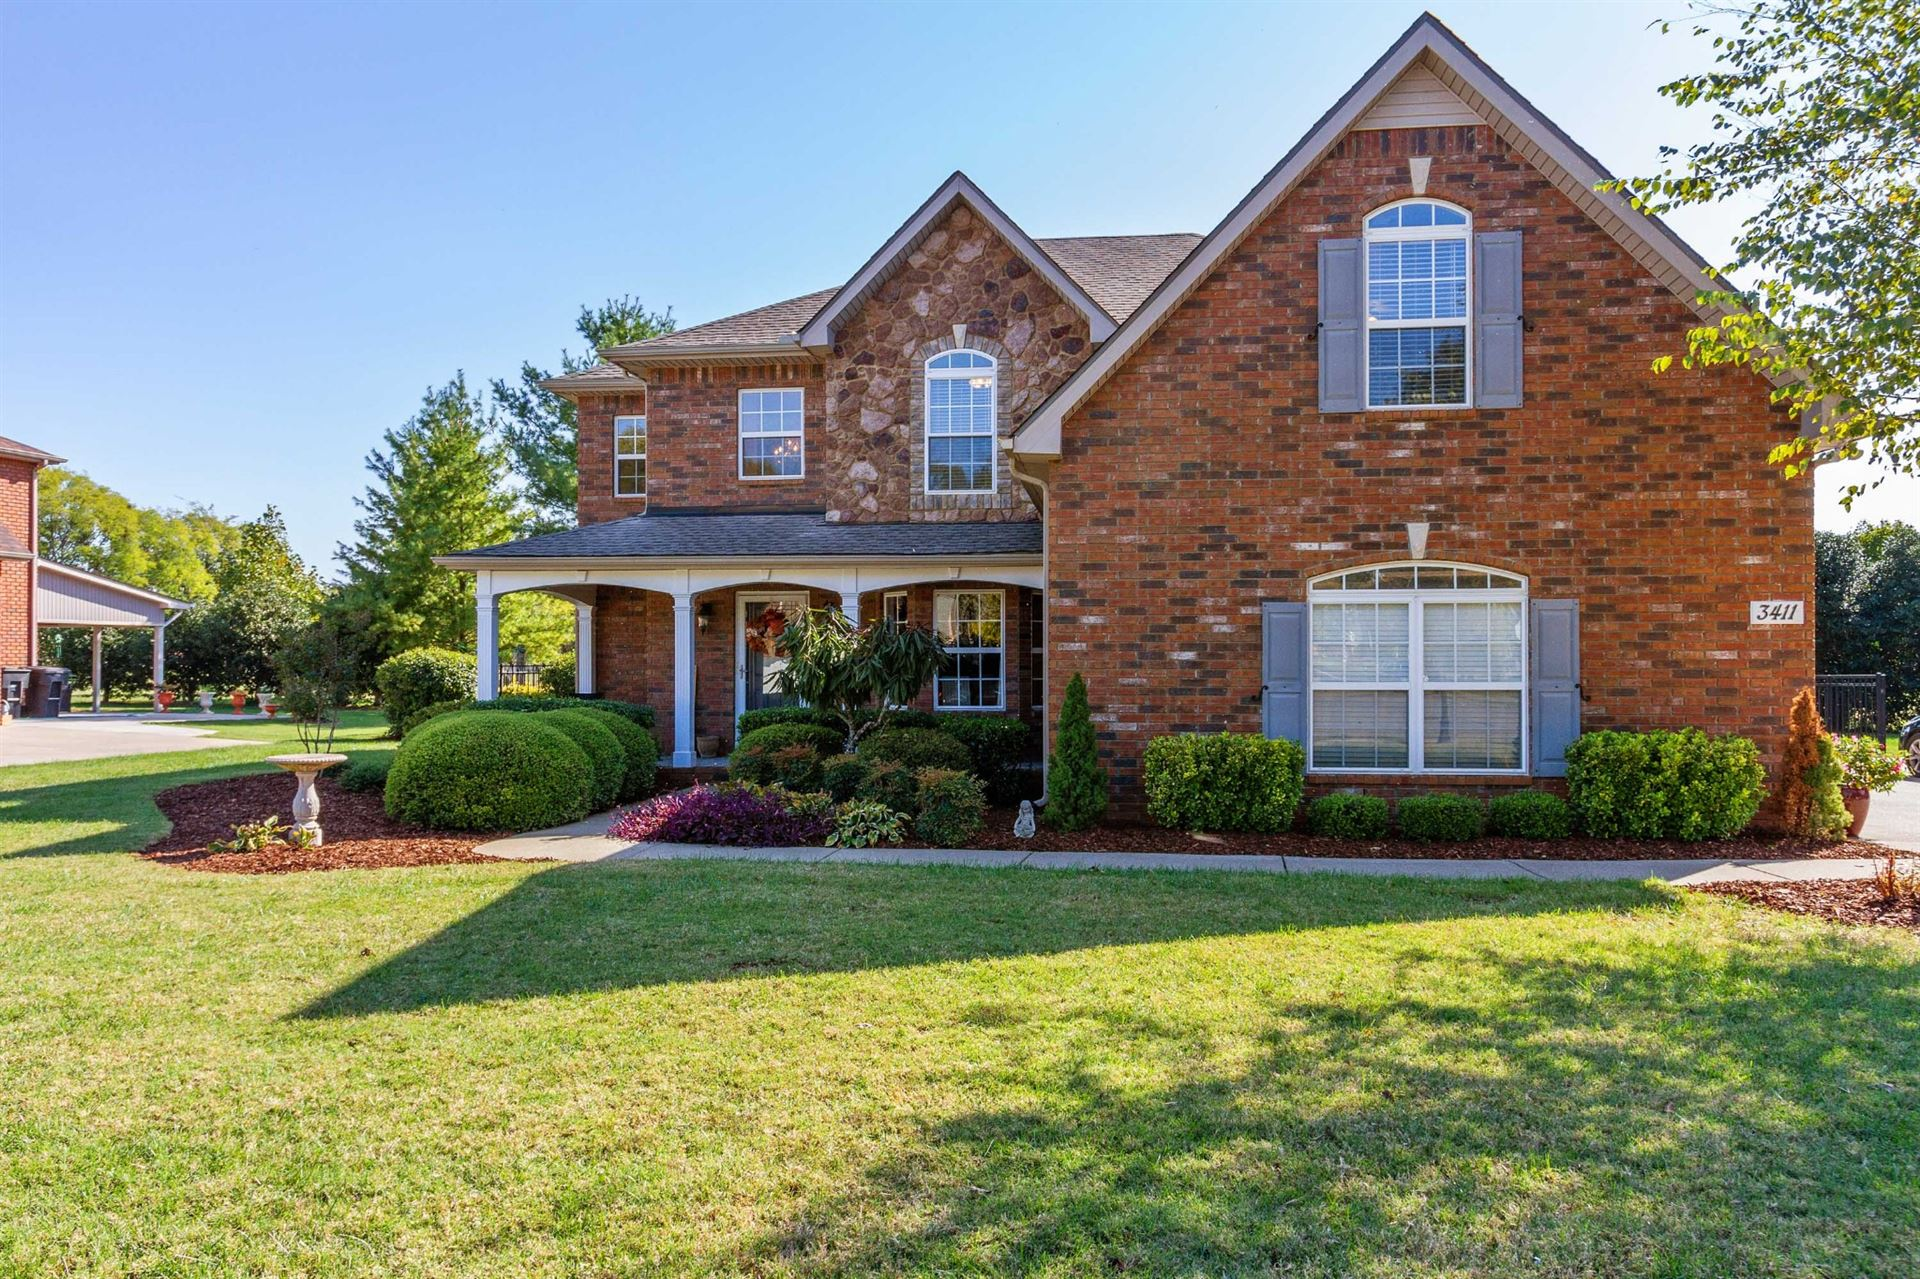 3411 Deerview Dr, Murfreesboro, TN 37128 - MLS#: 2196873